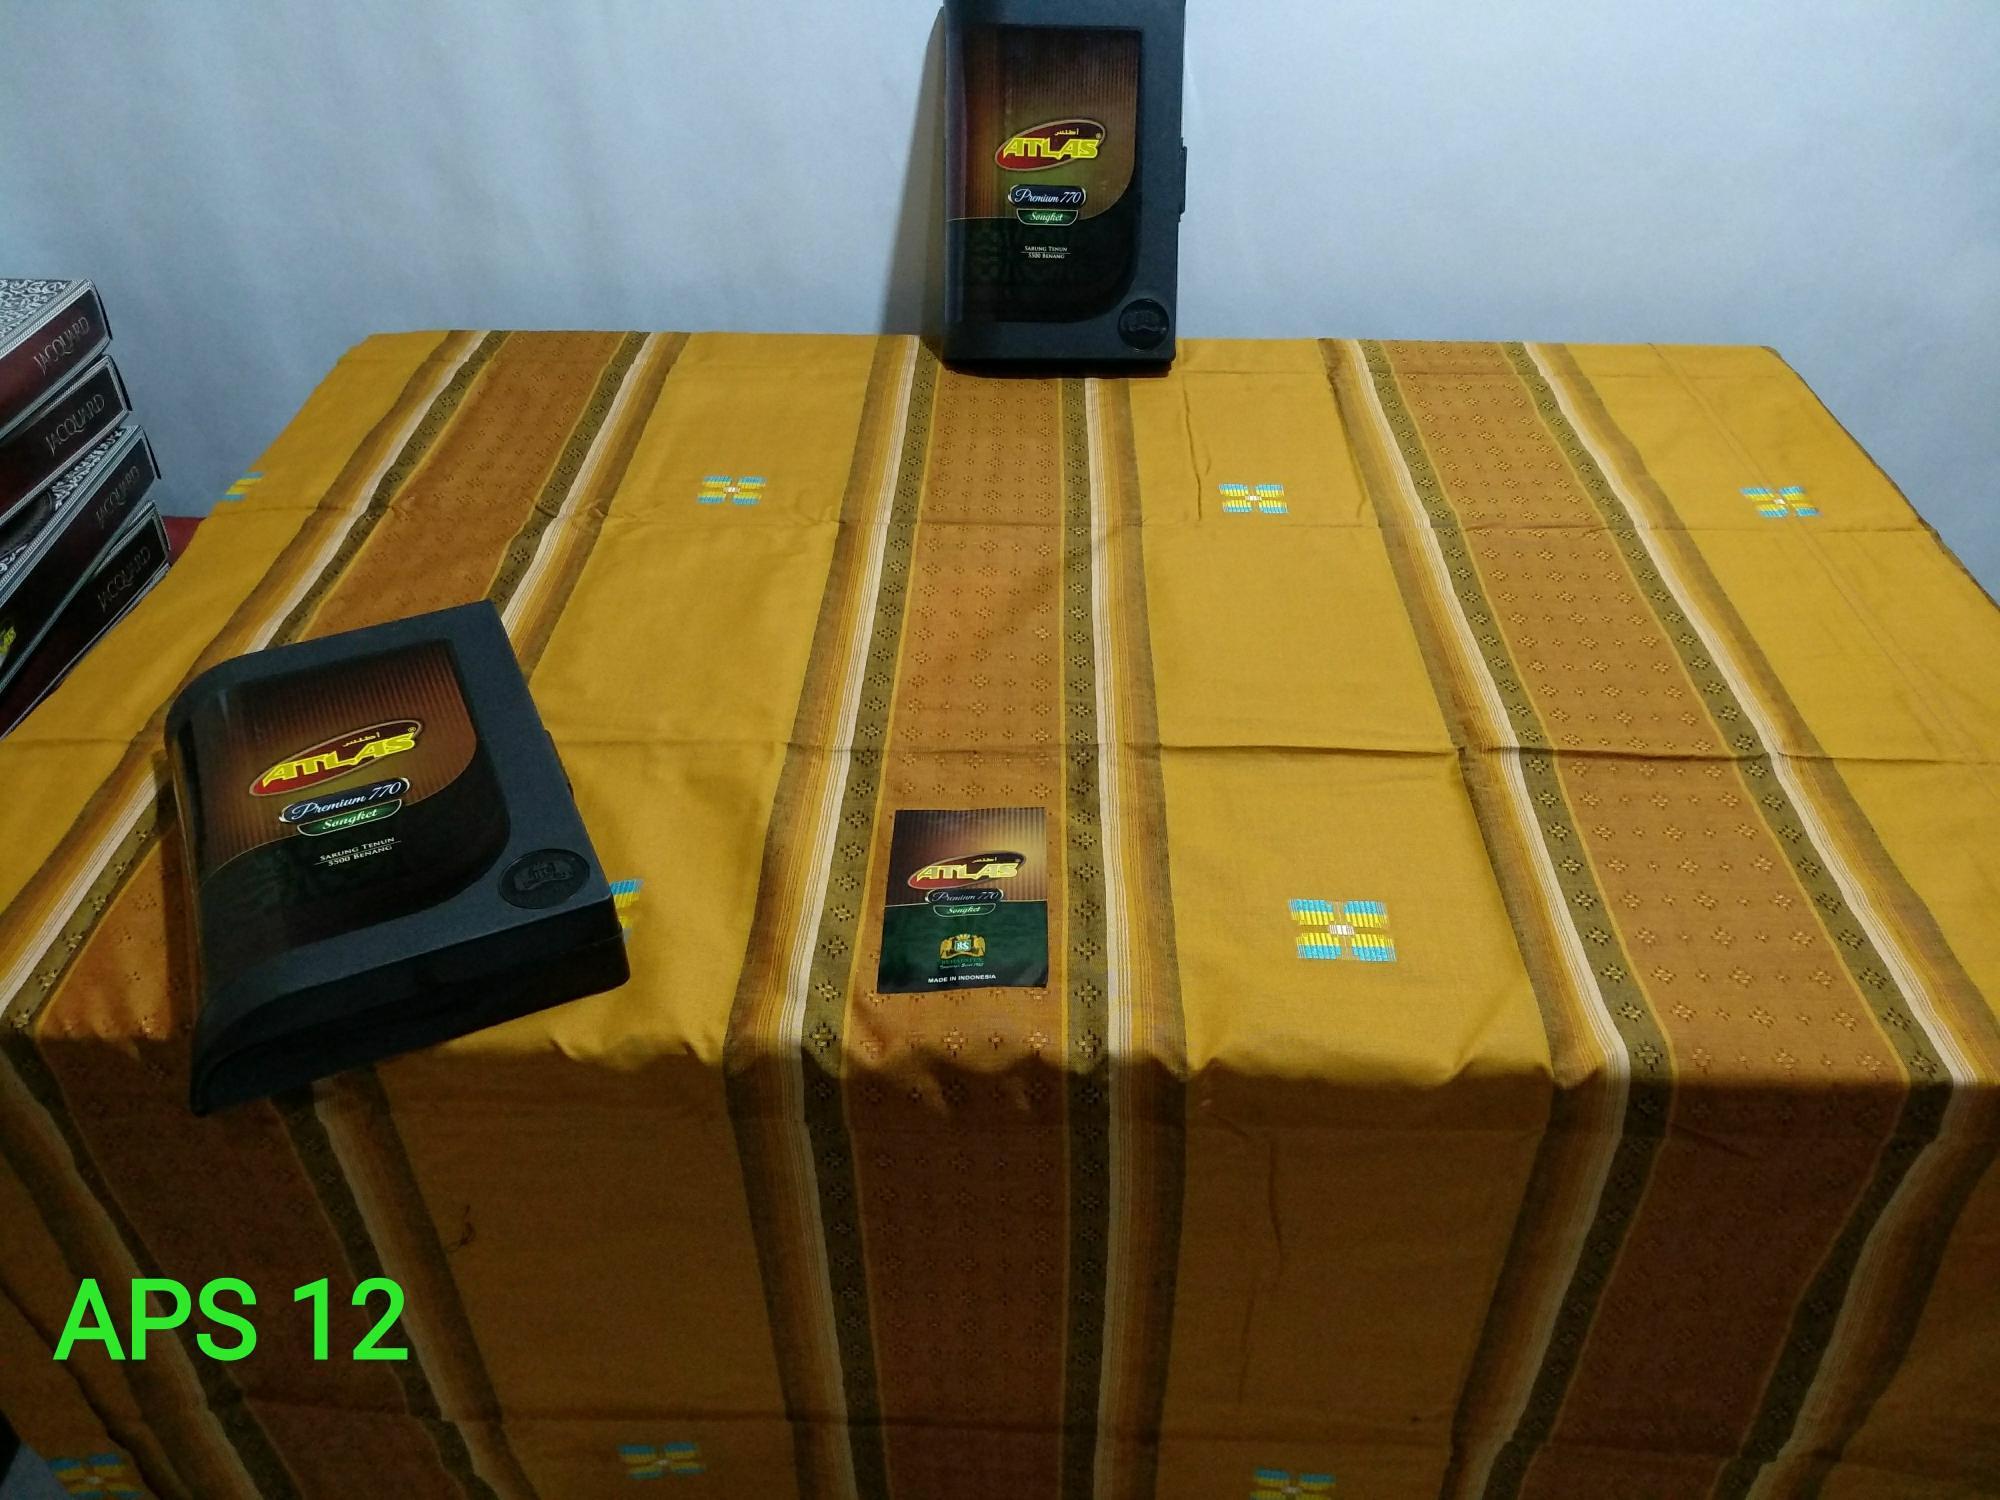 Sarung Atlas 770 premium songket /Sarung Atlas premium /Sarung Atlas Songket /Sarung Murah - Original Product